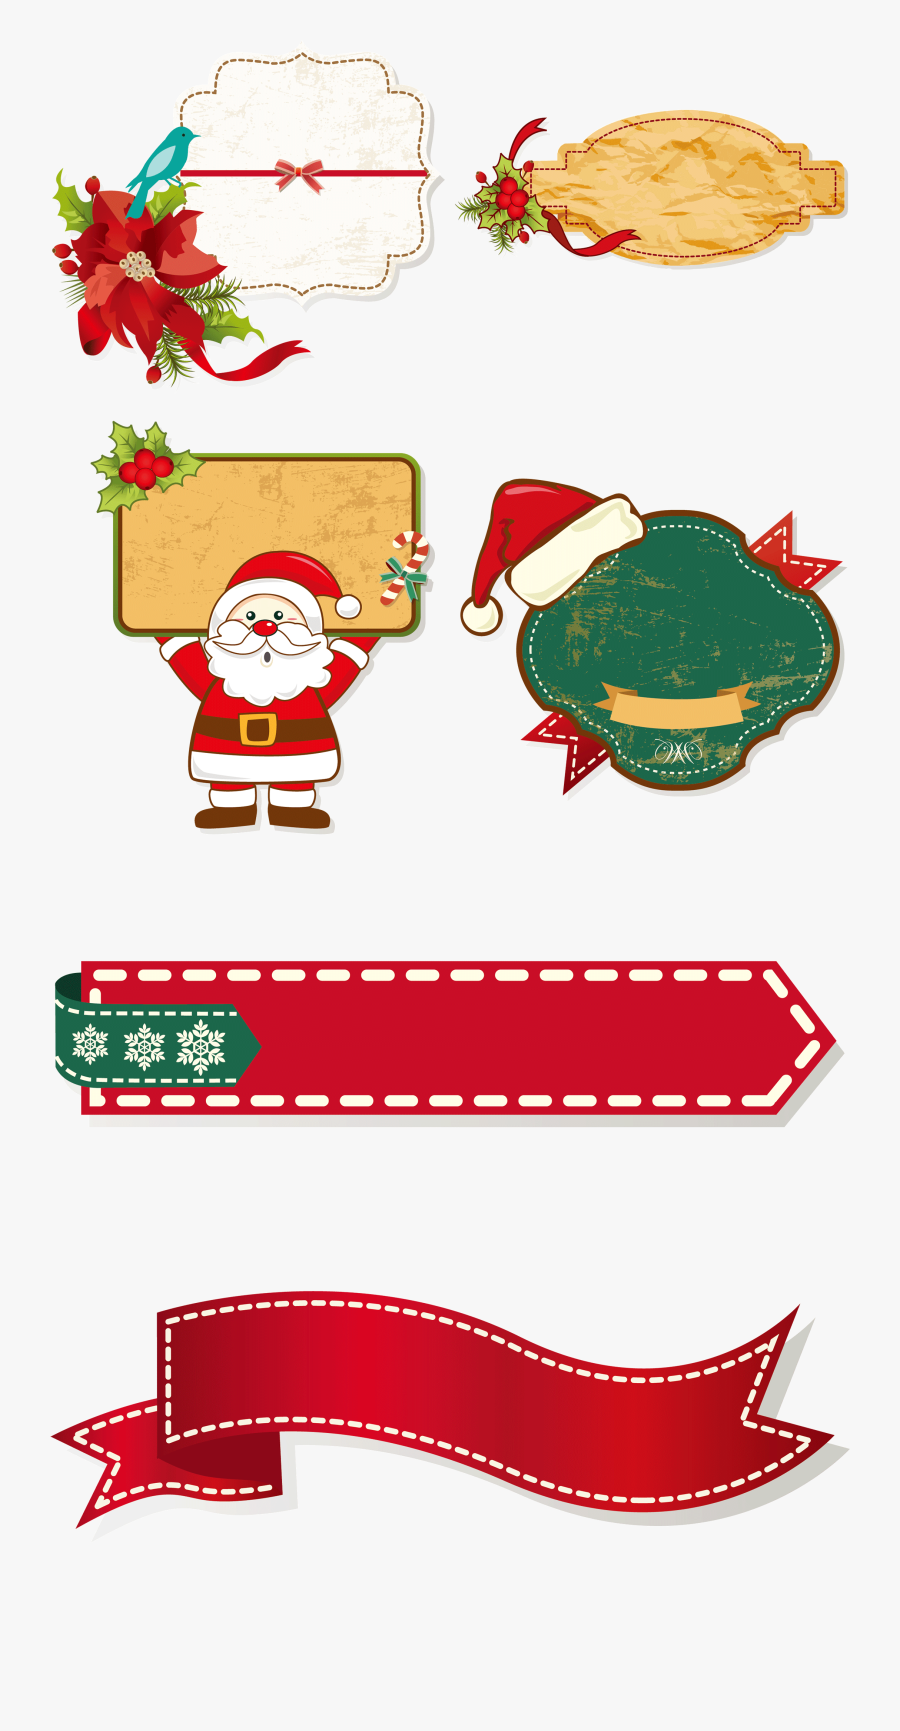 Claus Christmas Decoration Cartoon Collection - Santa Claus Borders Christmas, Transparent Clipart